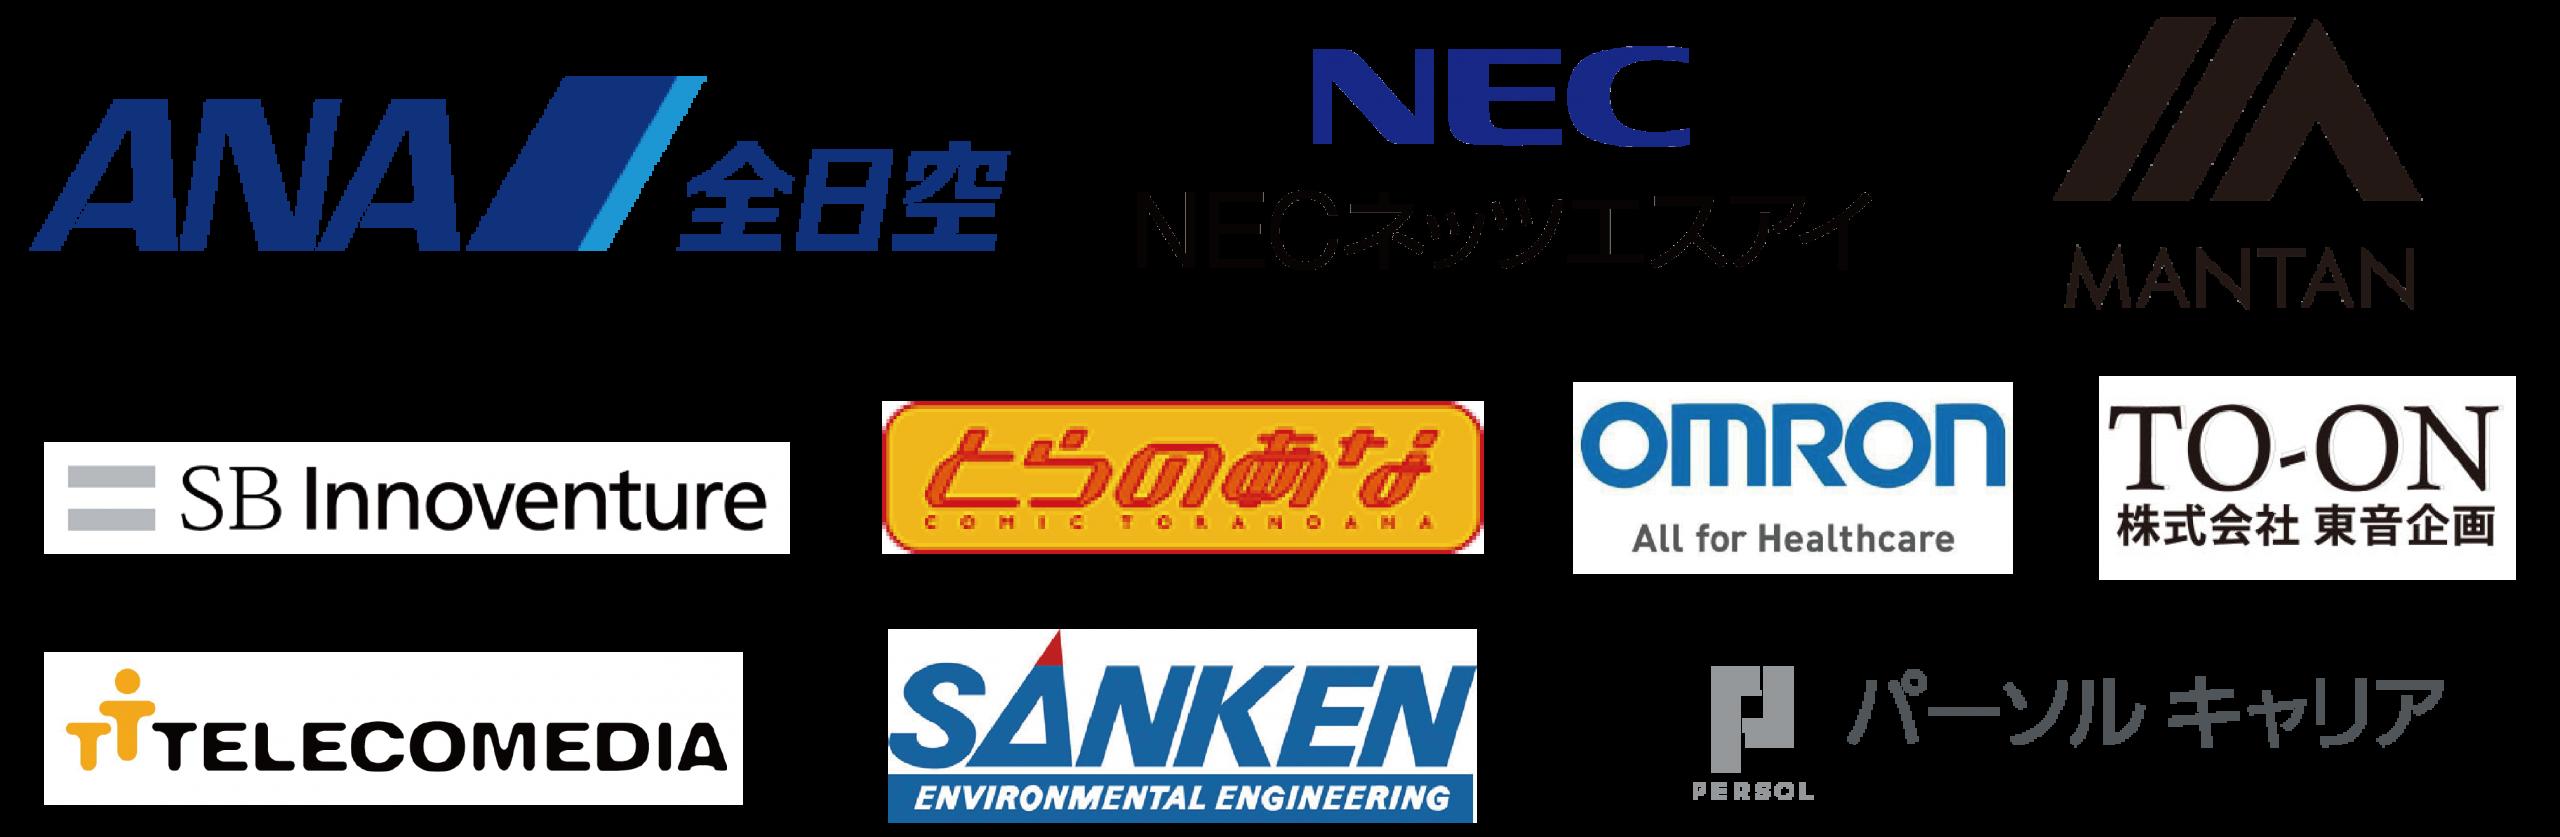 cloud ace 企業合作 廠商logo